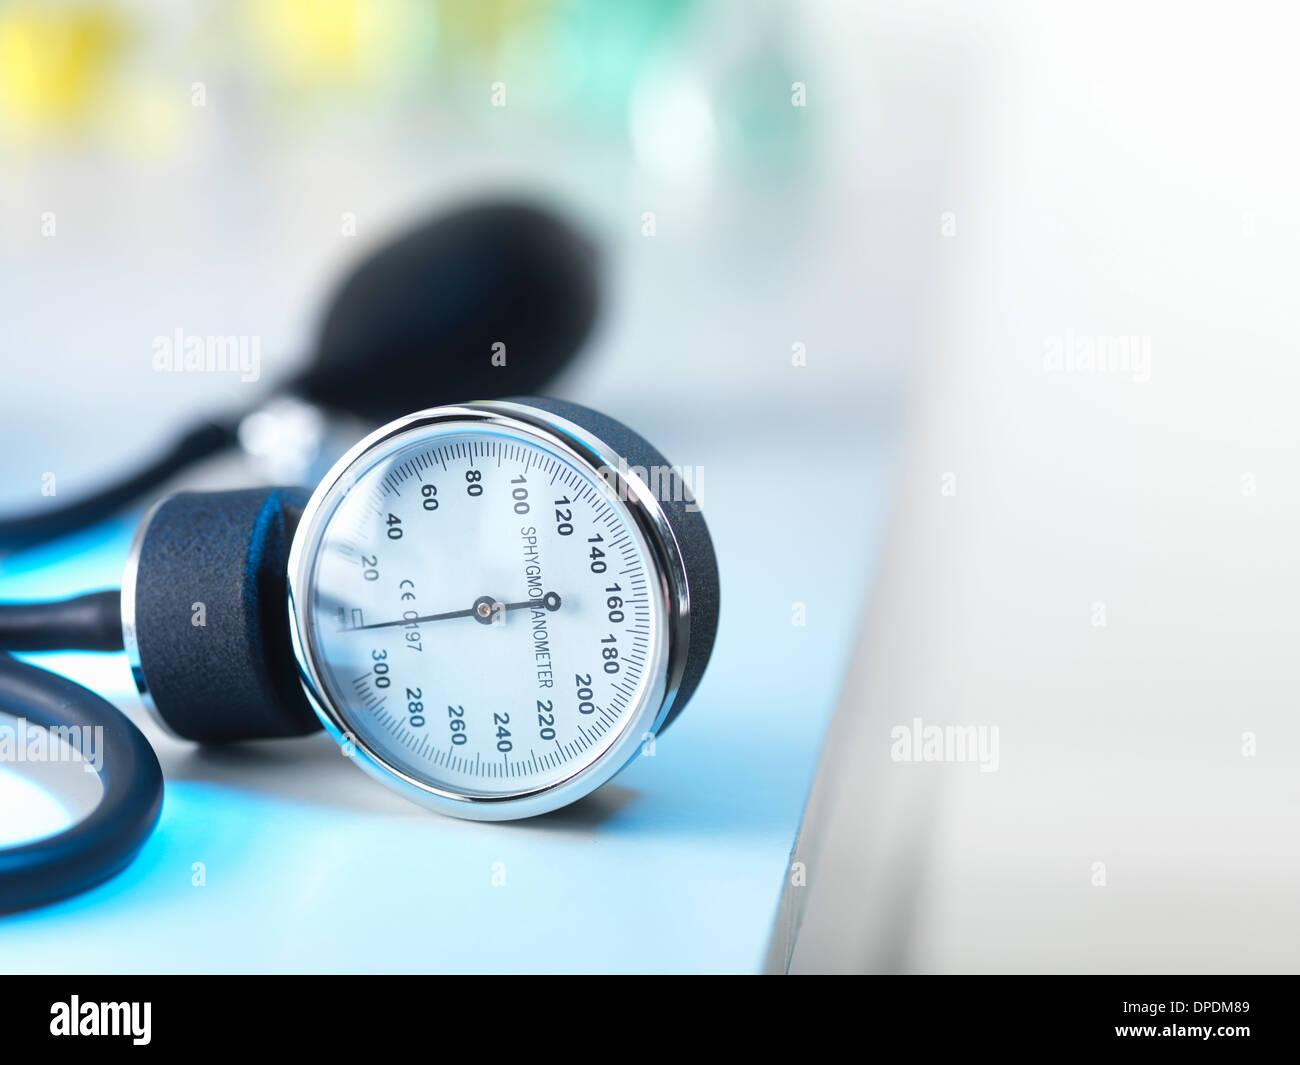 Blood pressure gauge in Doctors surgery - Stock Image